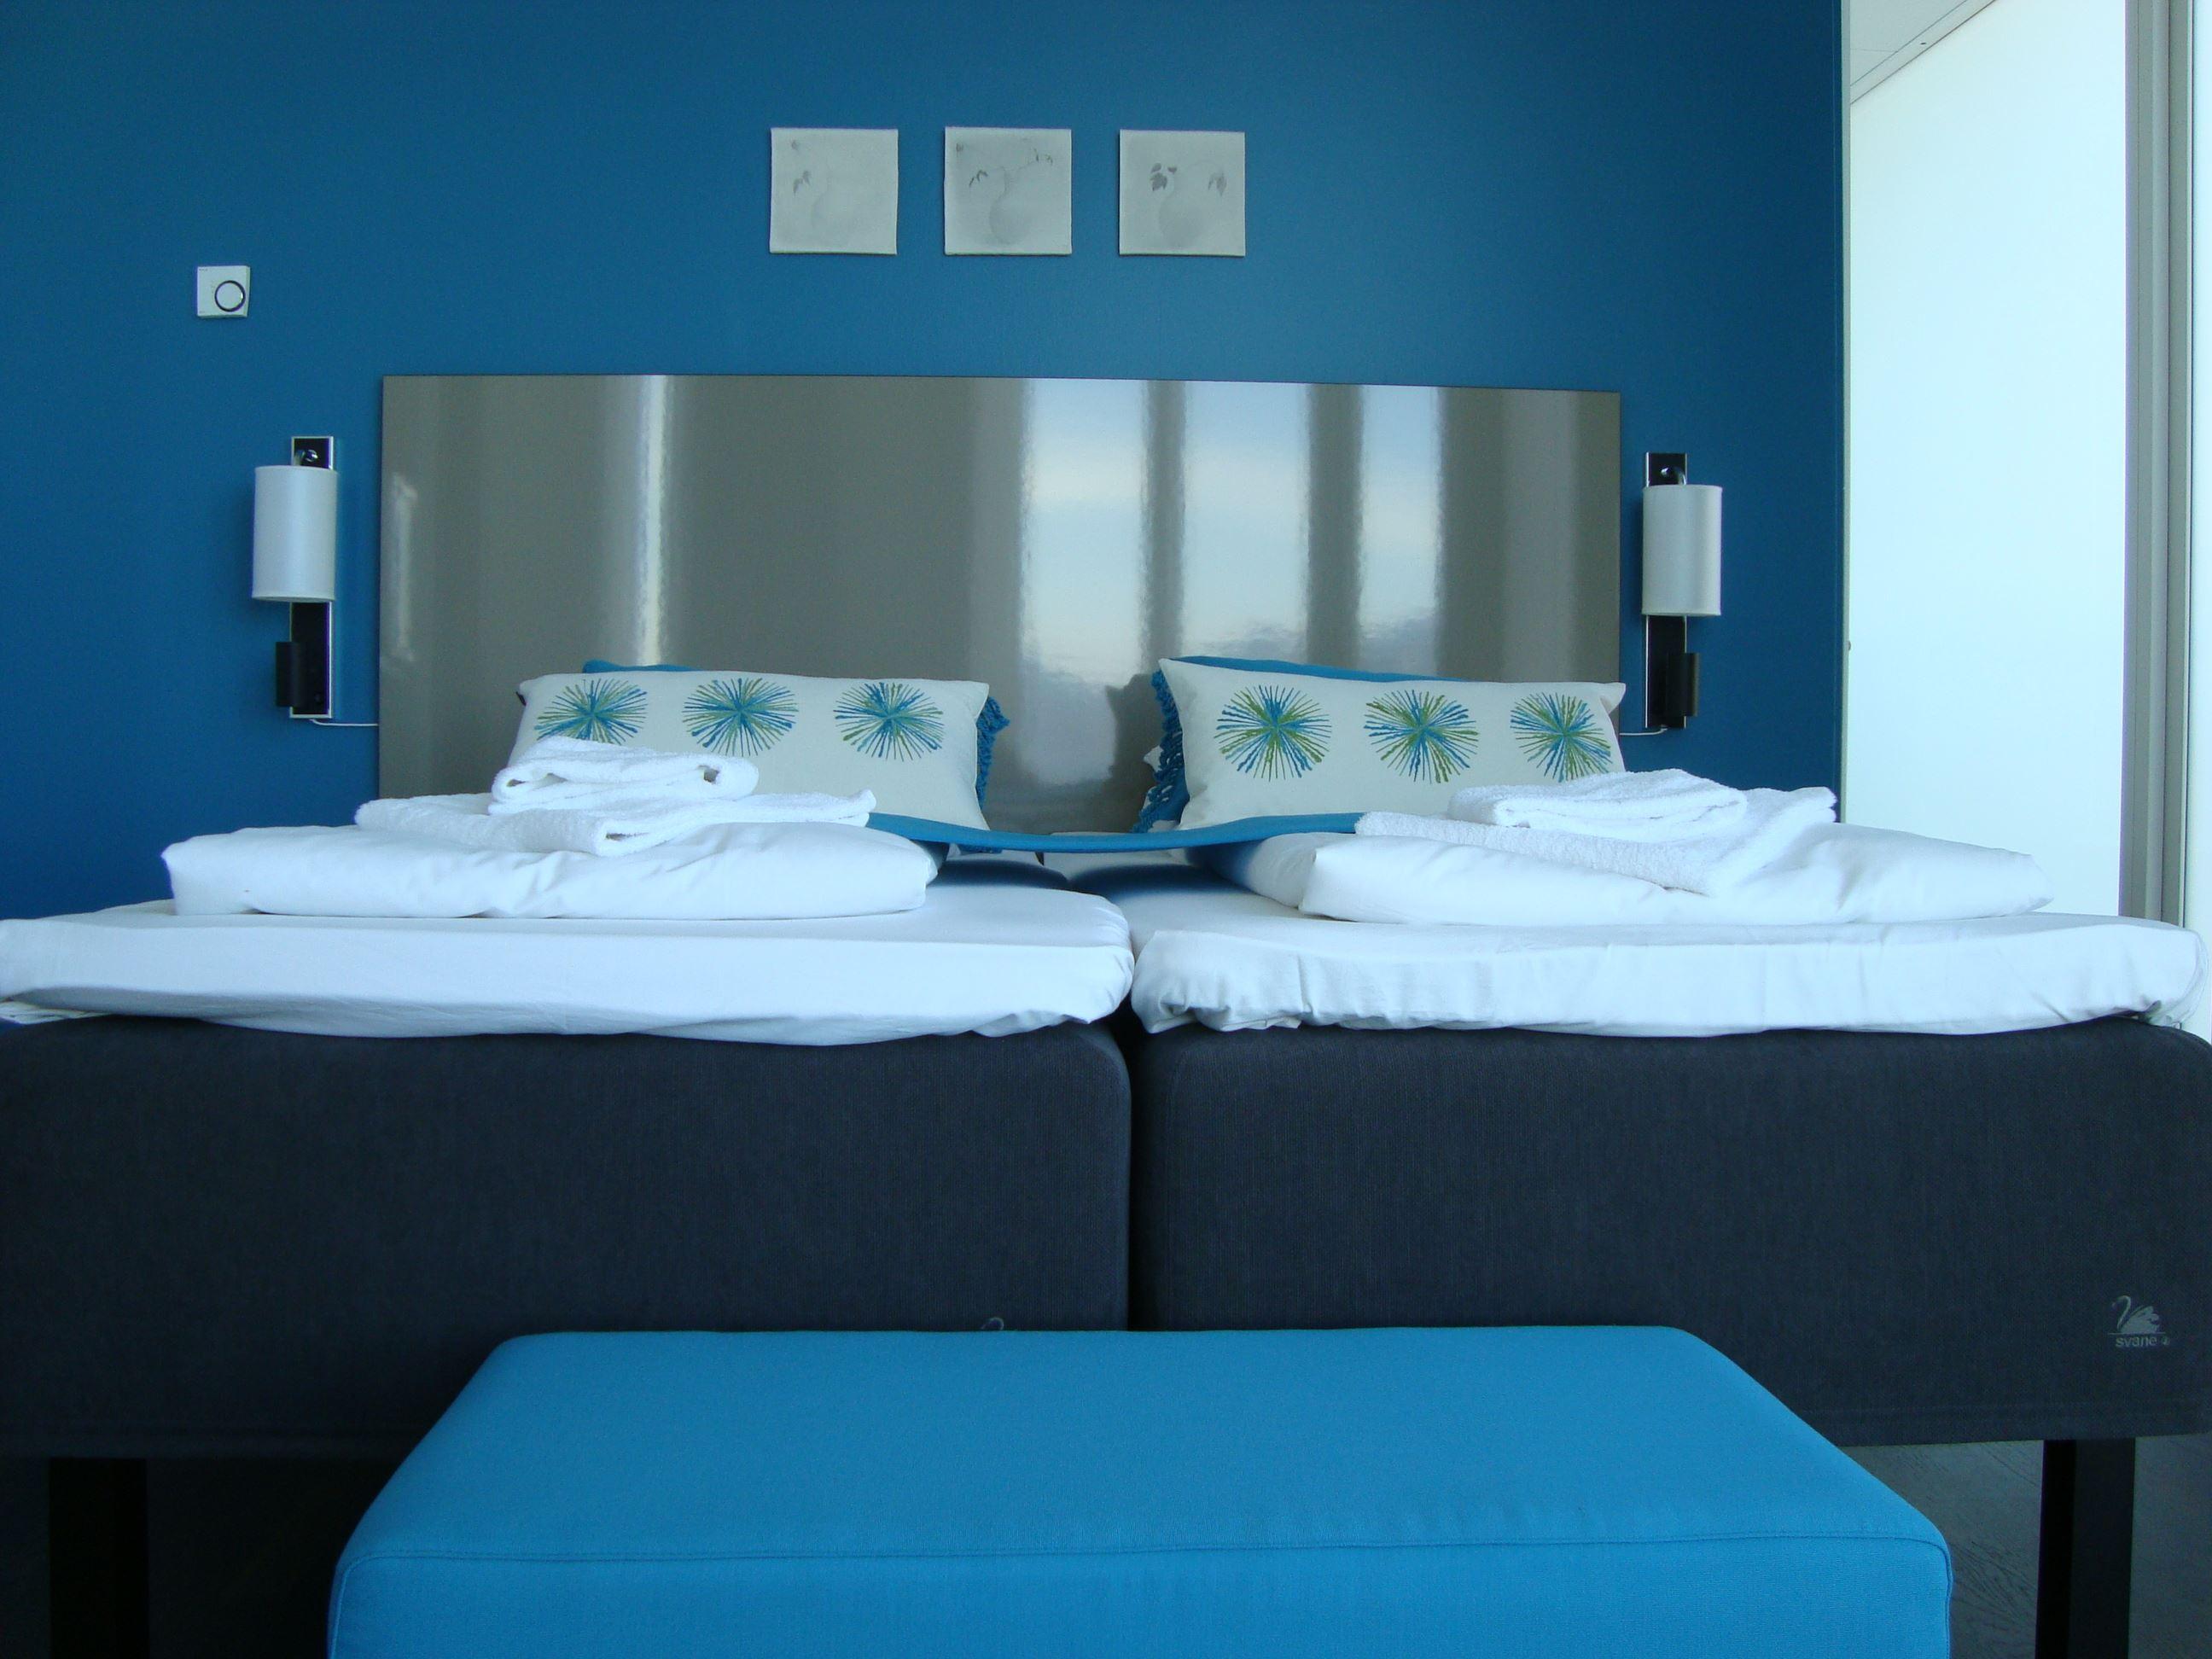 © Lofoten Suitehotel, Lofoten SuiteHotel